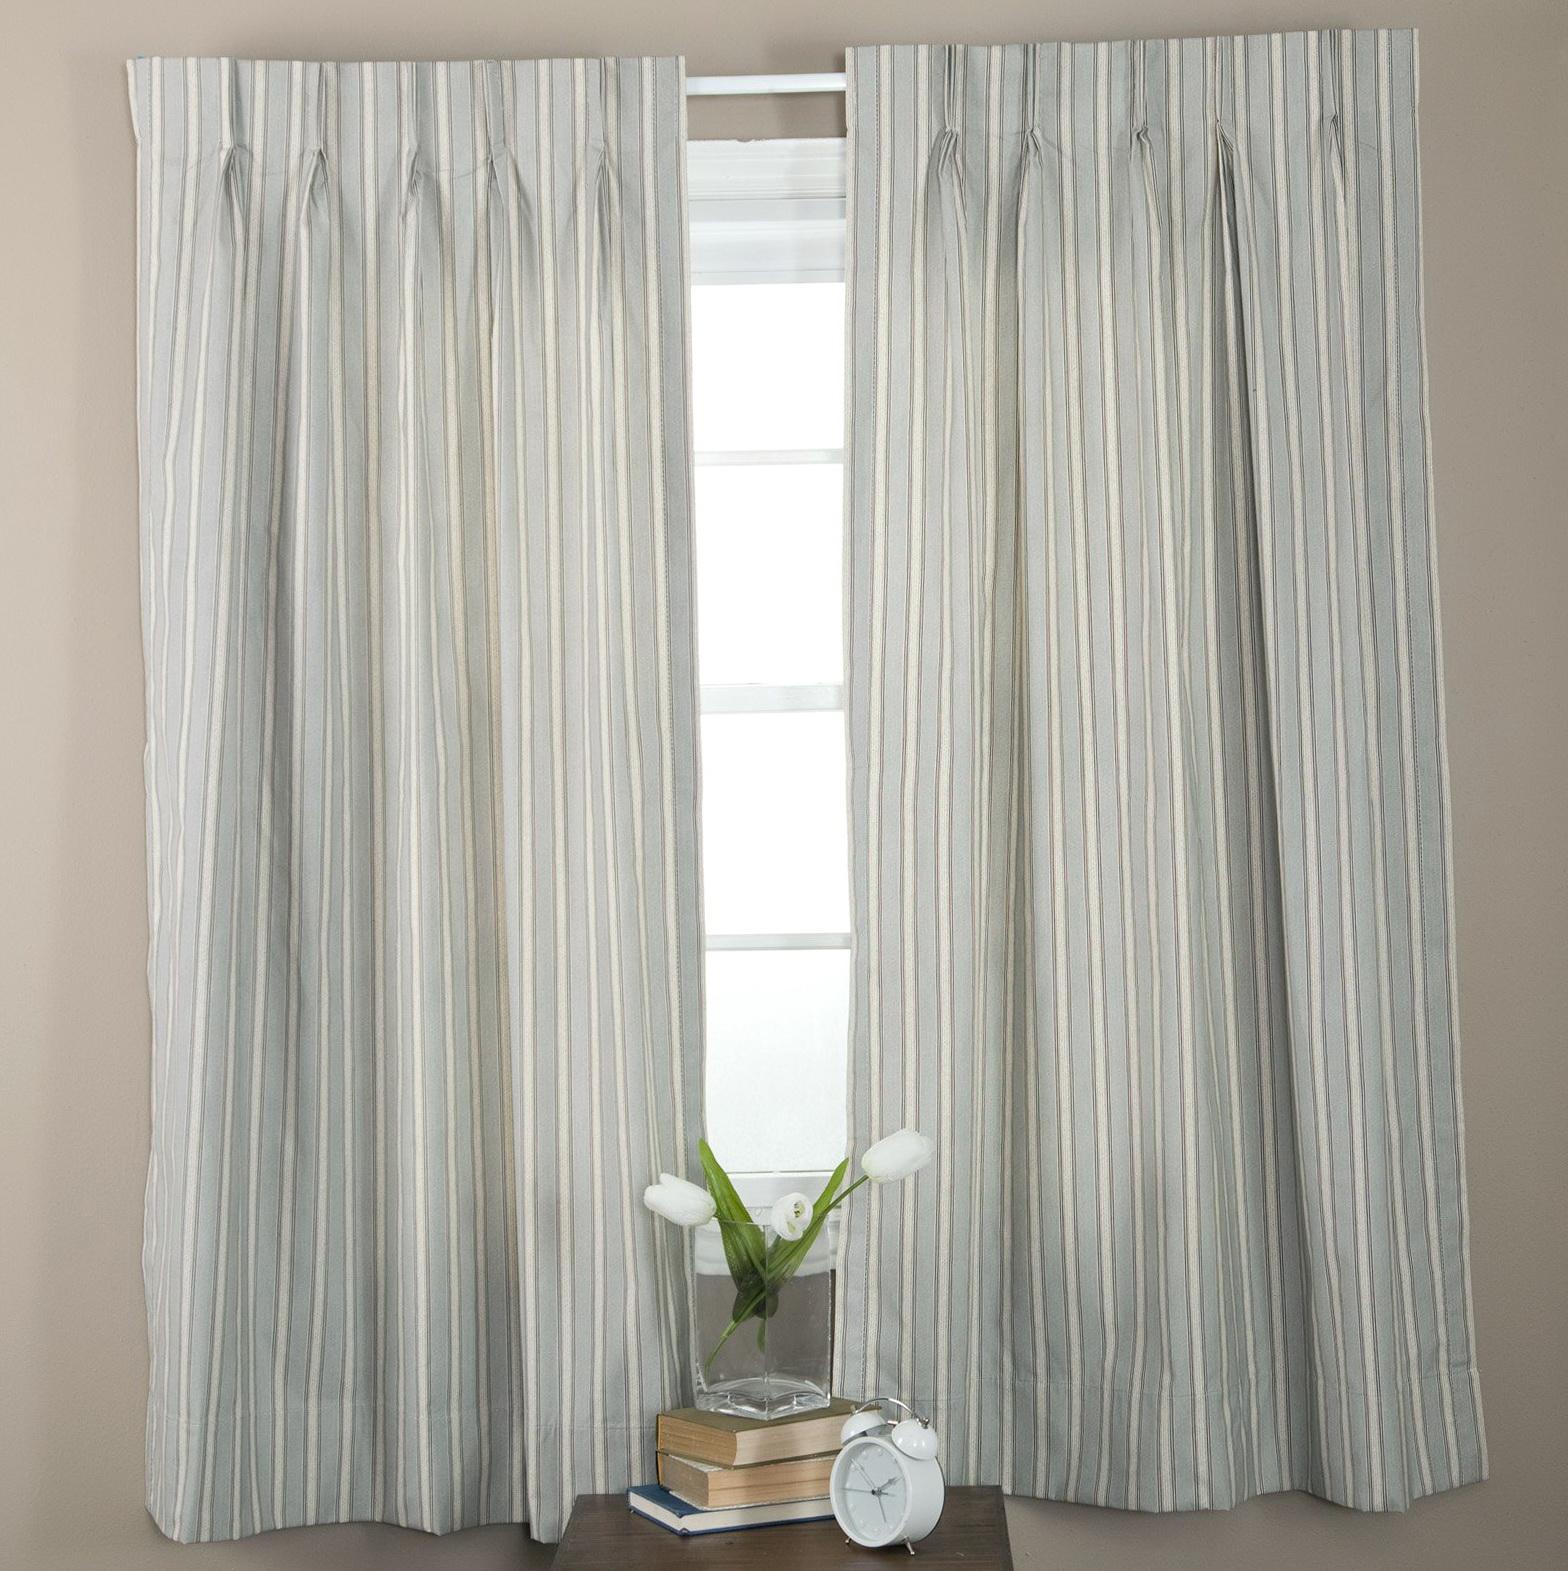 Patio Panel Curtains Drapes